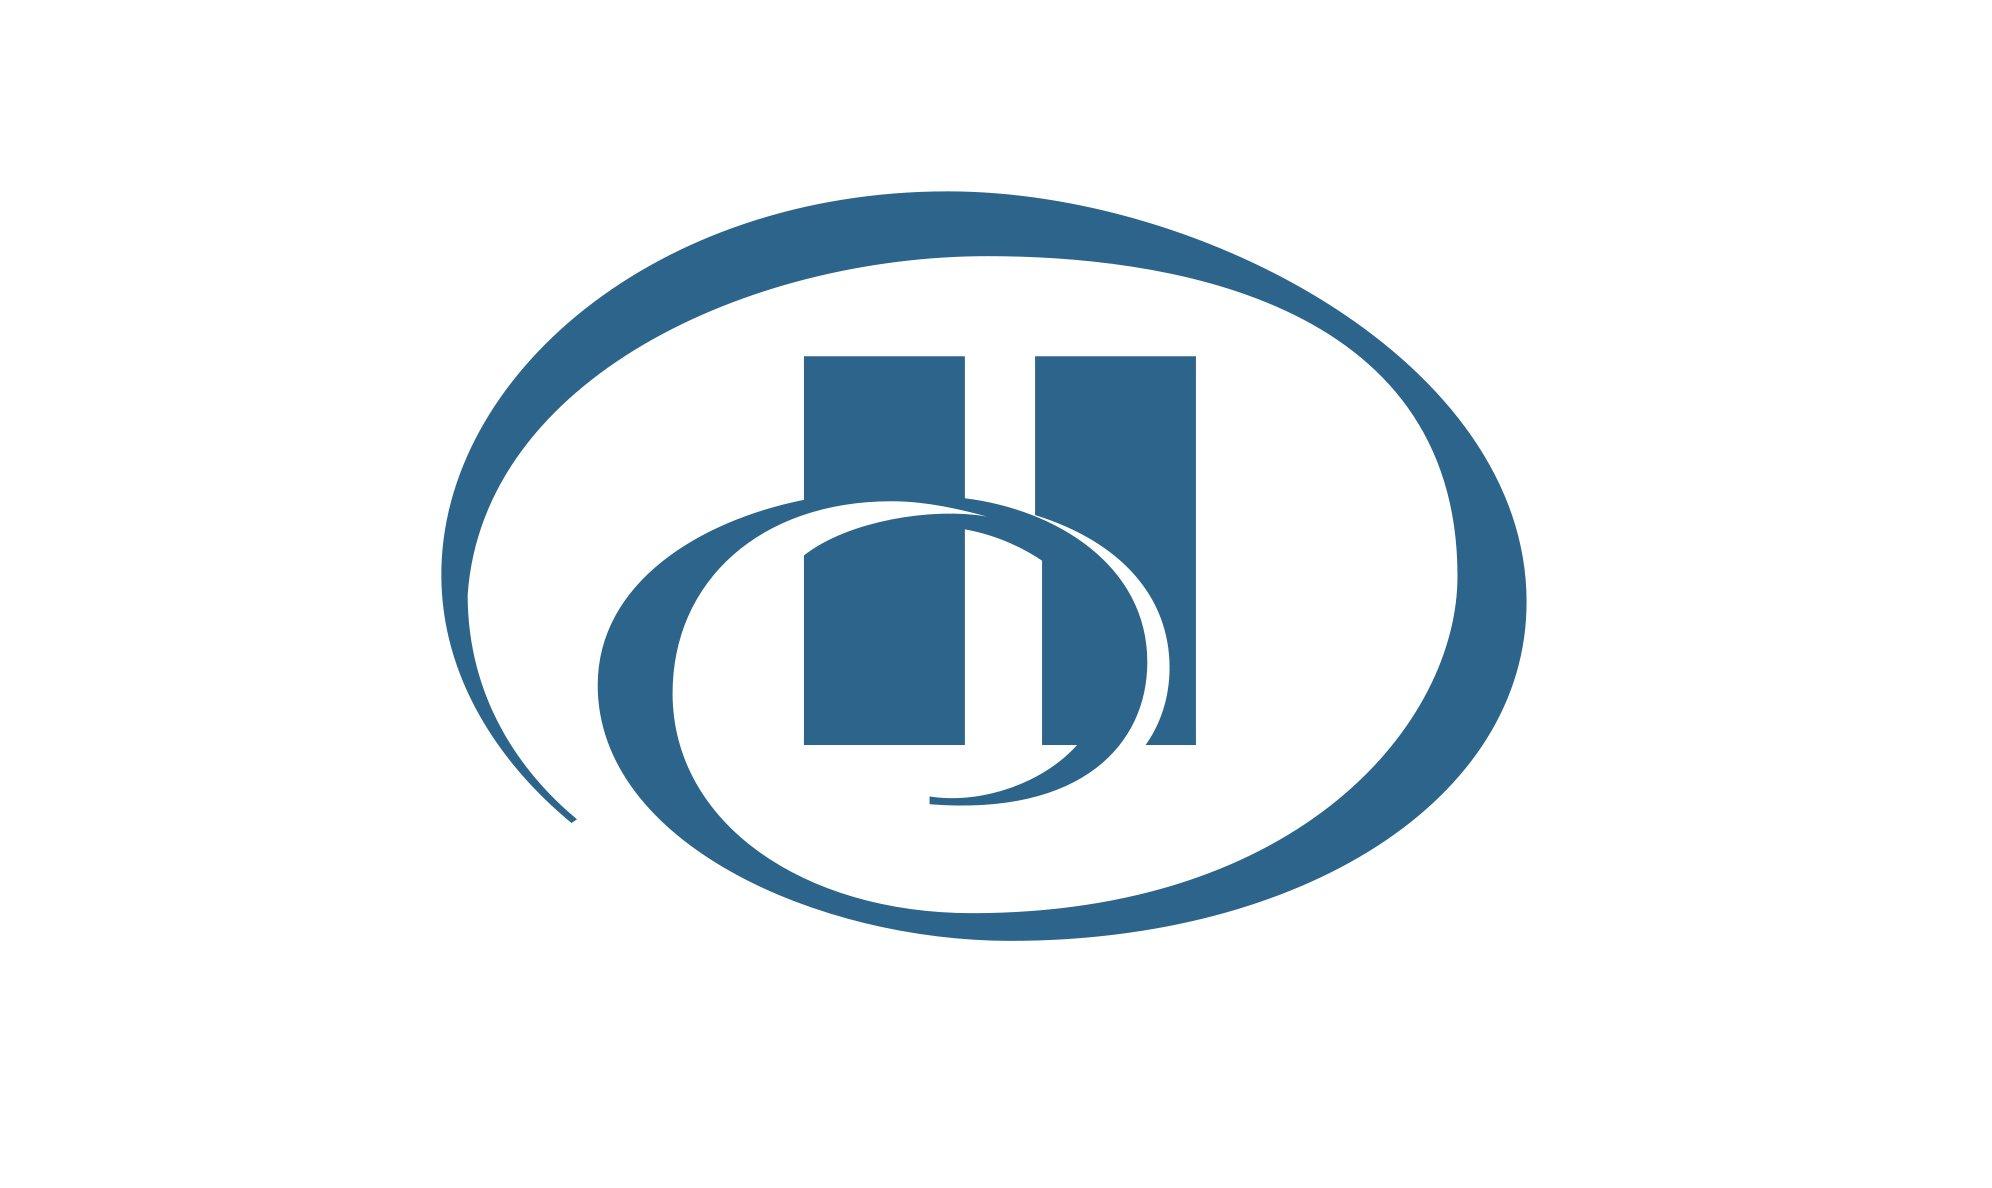 Hilton Symbol